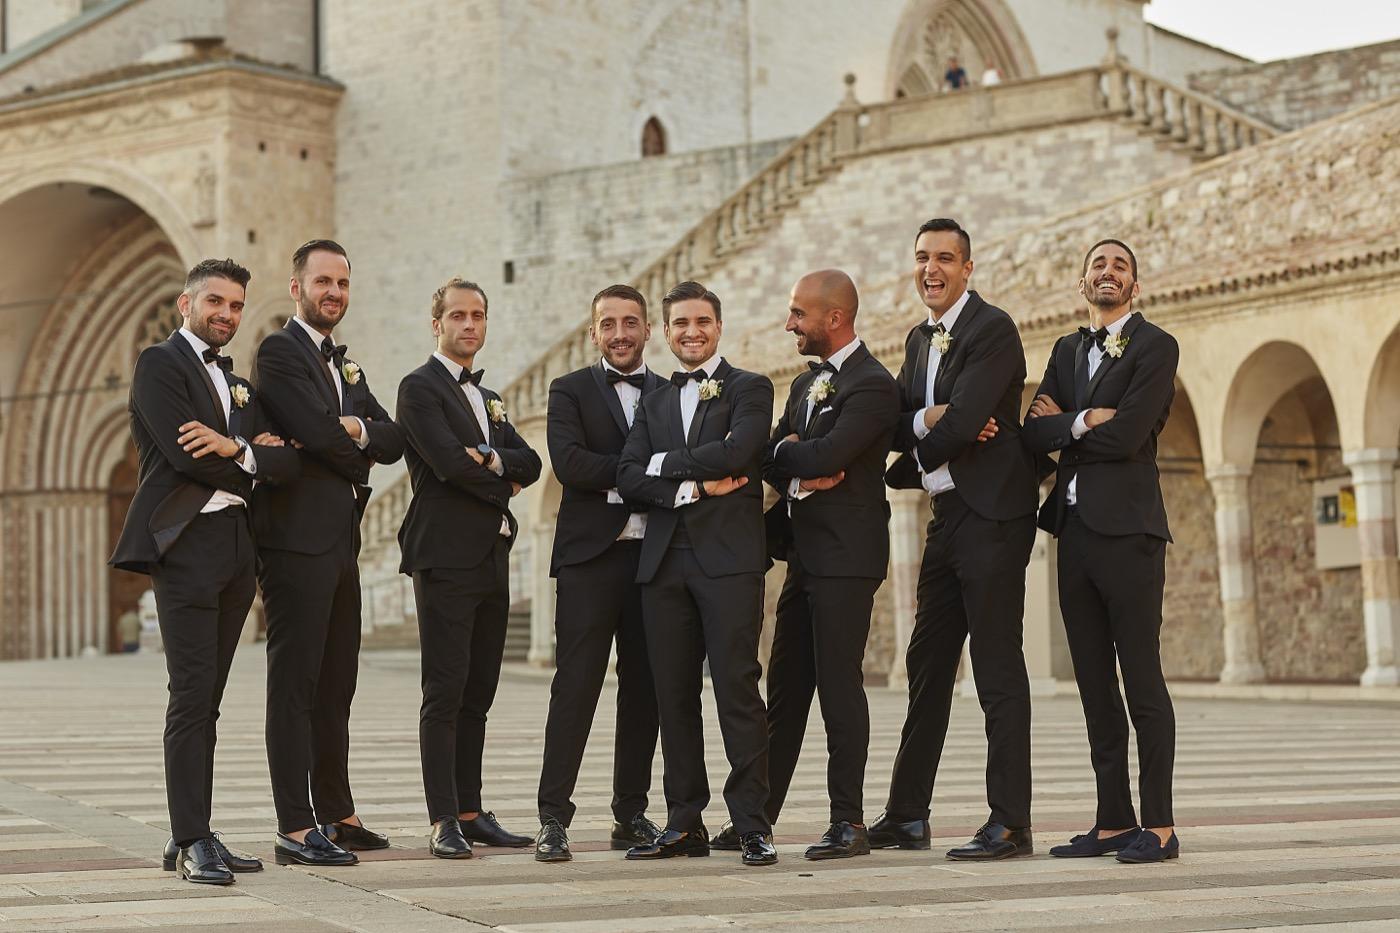 Claudio-Coppola-wedding-photographer-abbazia-7-frati-piegaro-7